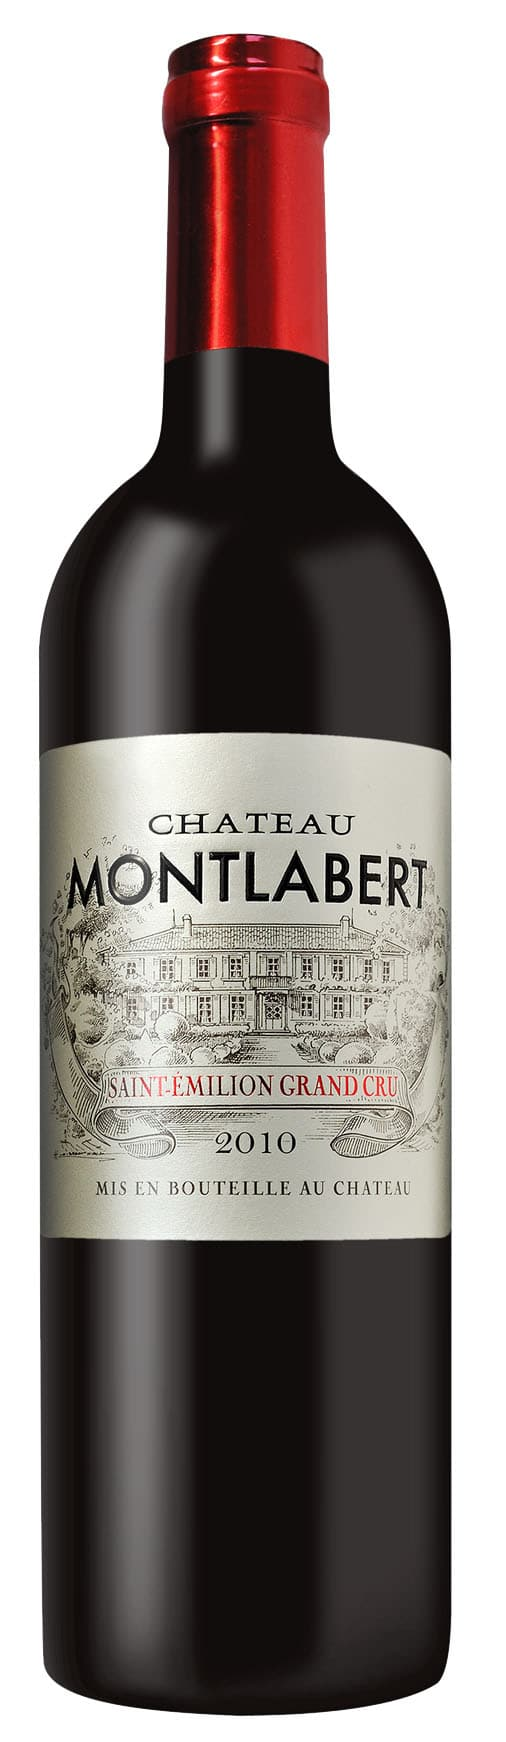 Chateau-Montalbert.jpg